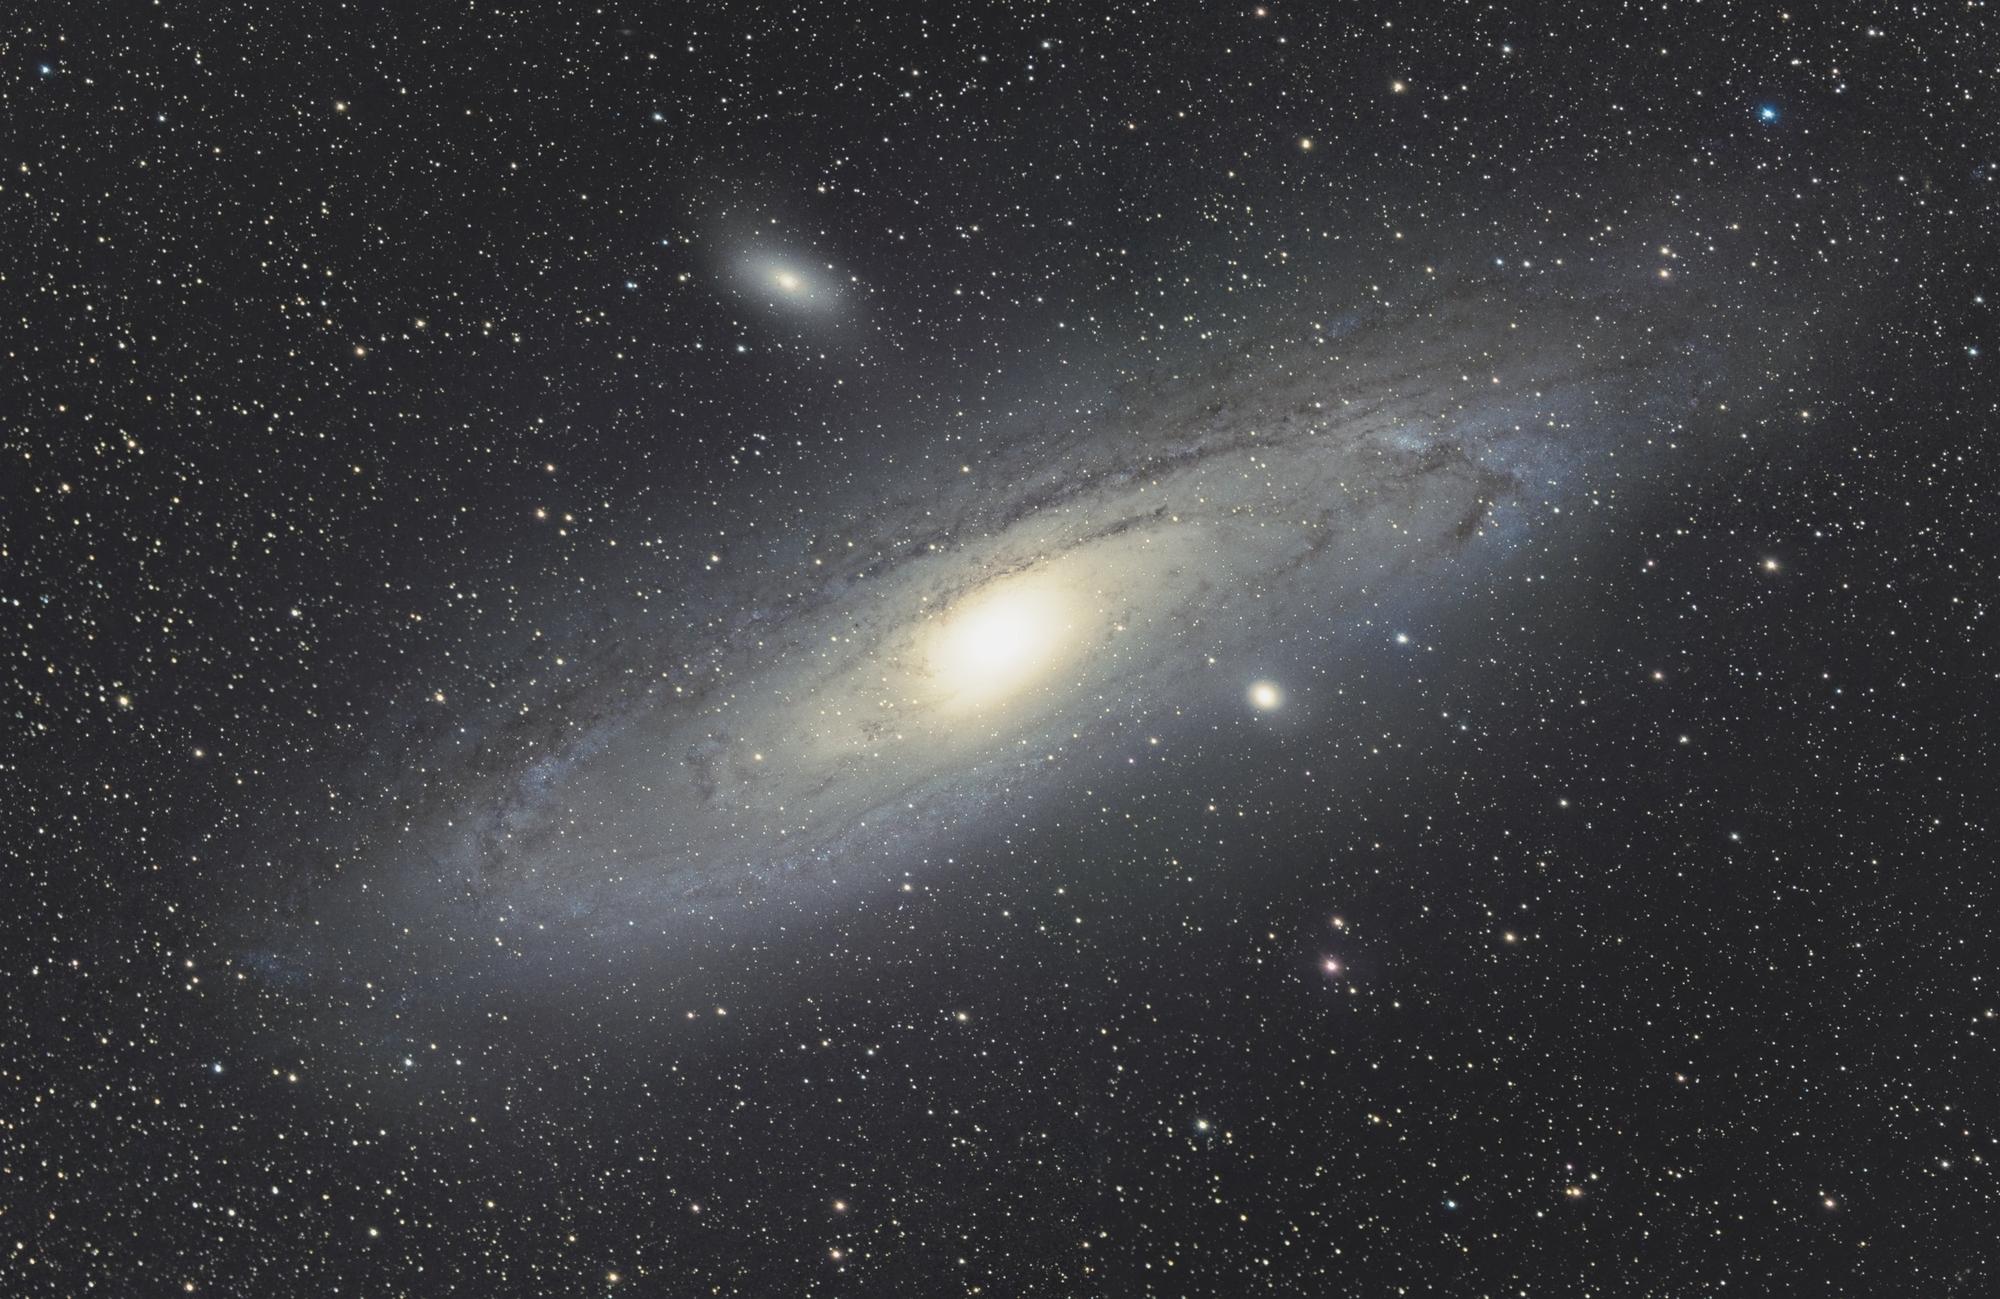 f:id:snct-astro:20191102211835j:plain